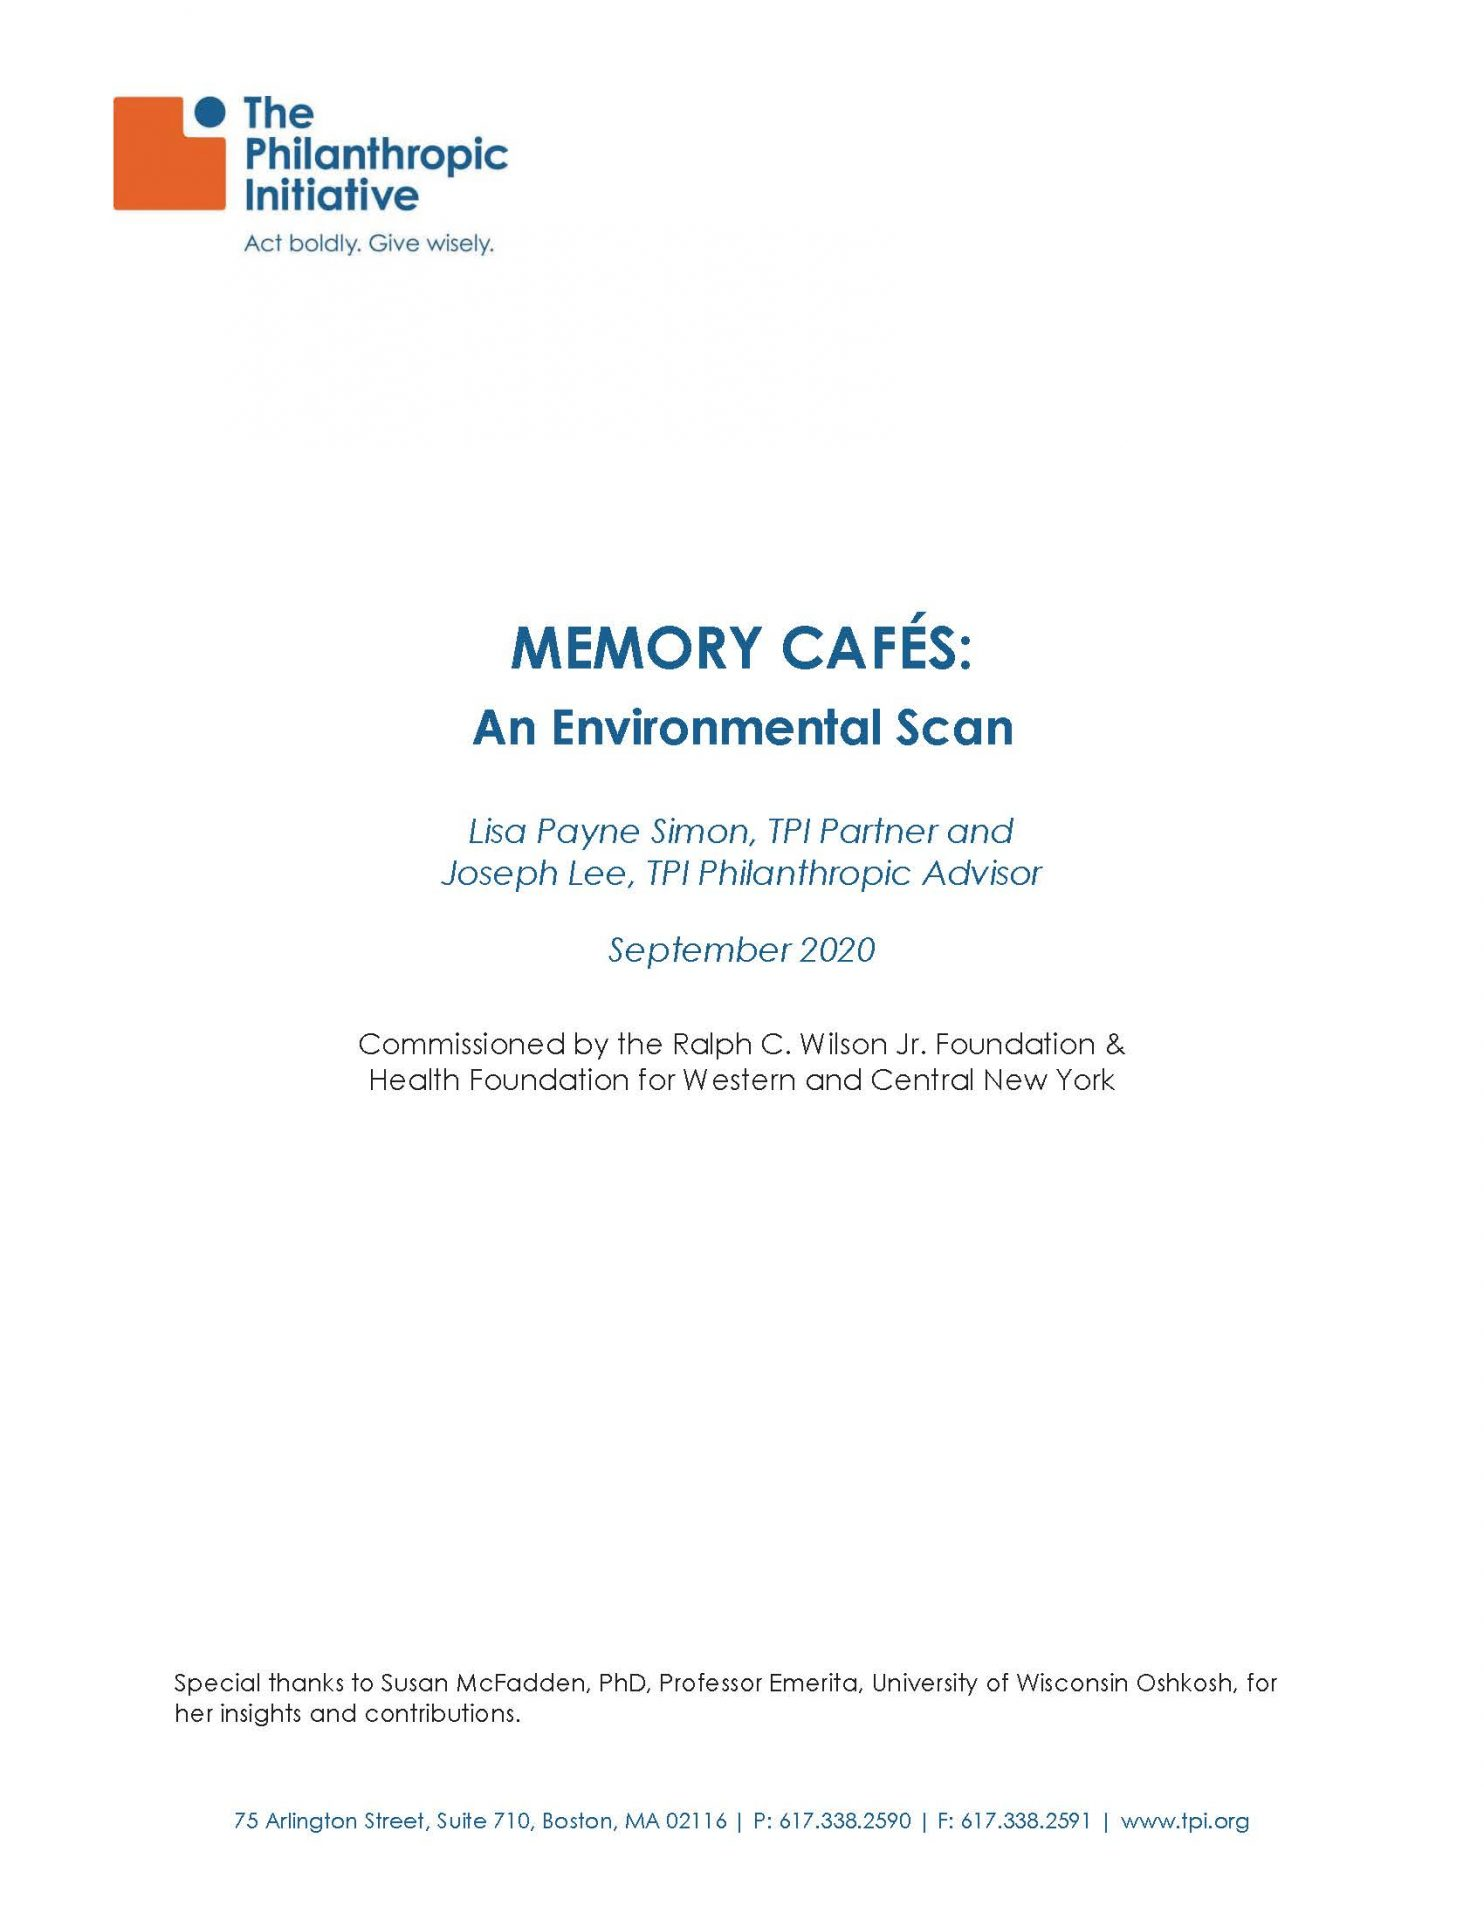 Memory Cafe Environmental Scan_Final Cover